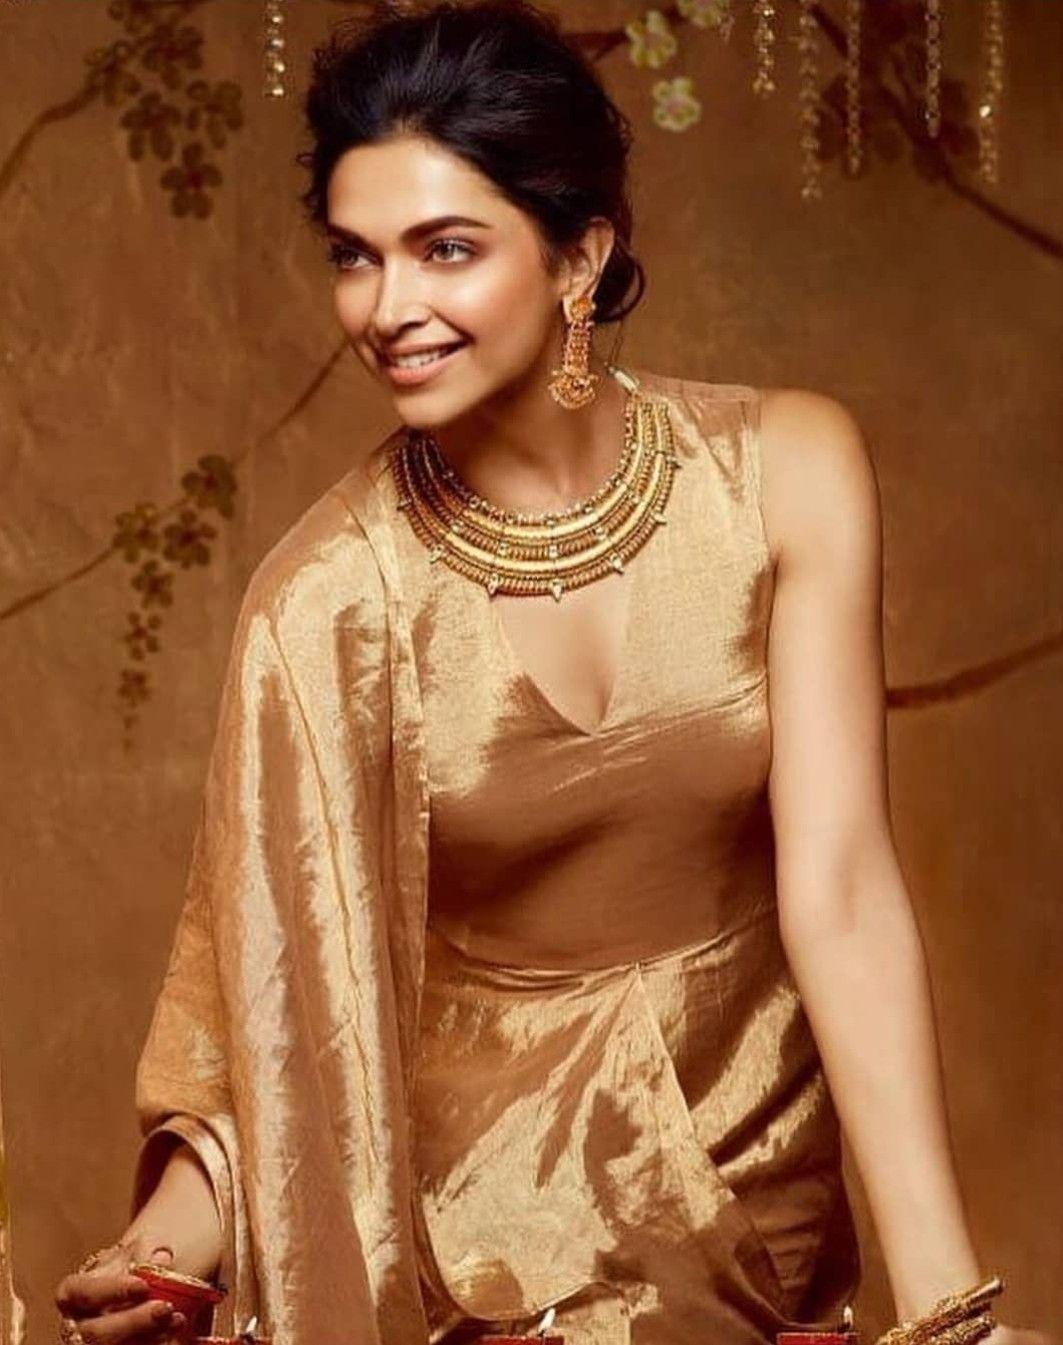 Deepika Padukone For New Utsava Collection By Tanishq Jewellery Deepika Padukone Style Deepika Padukone Hot Deepika Padukone